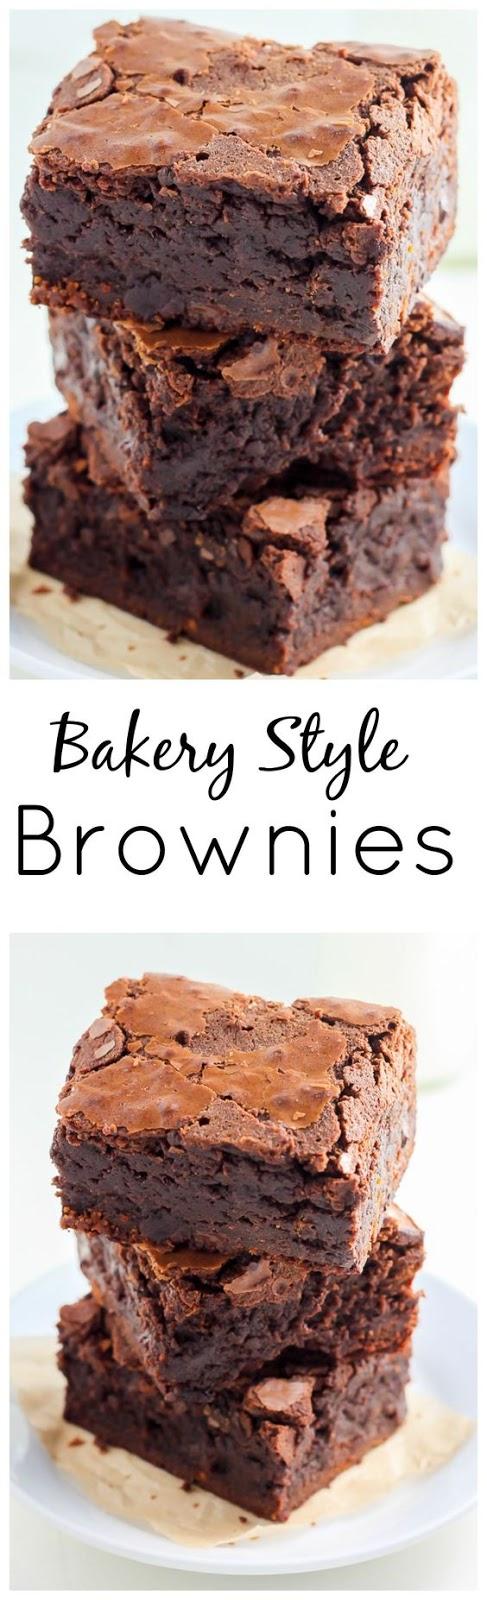 Baked Browníes